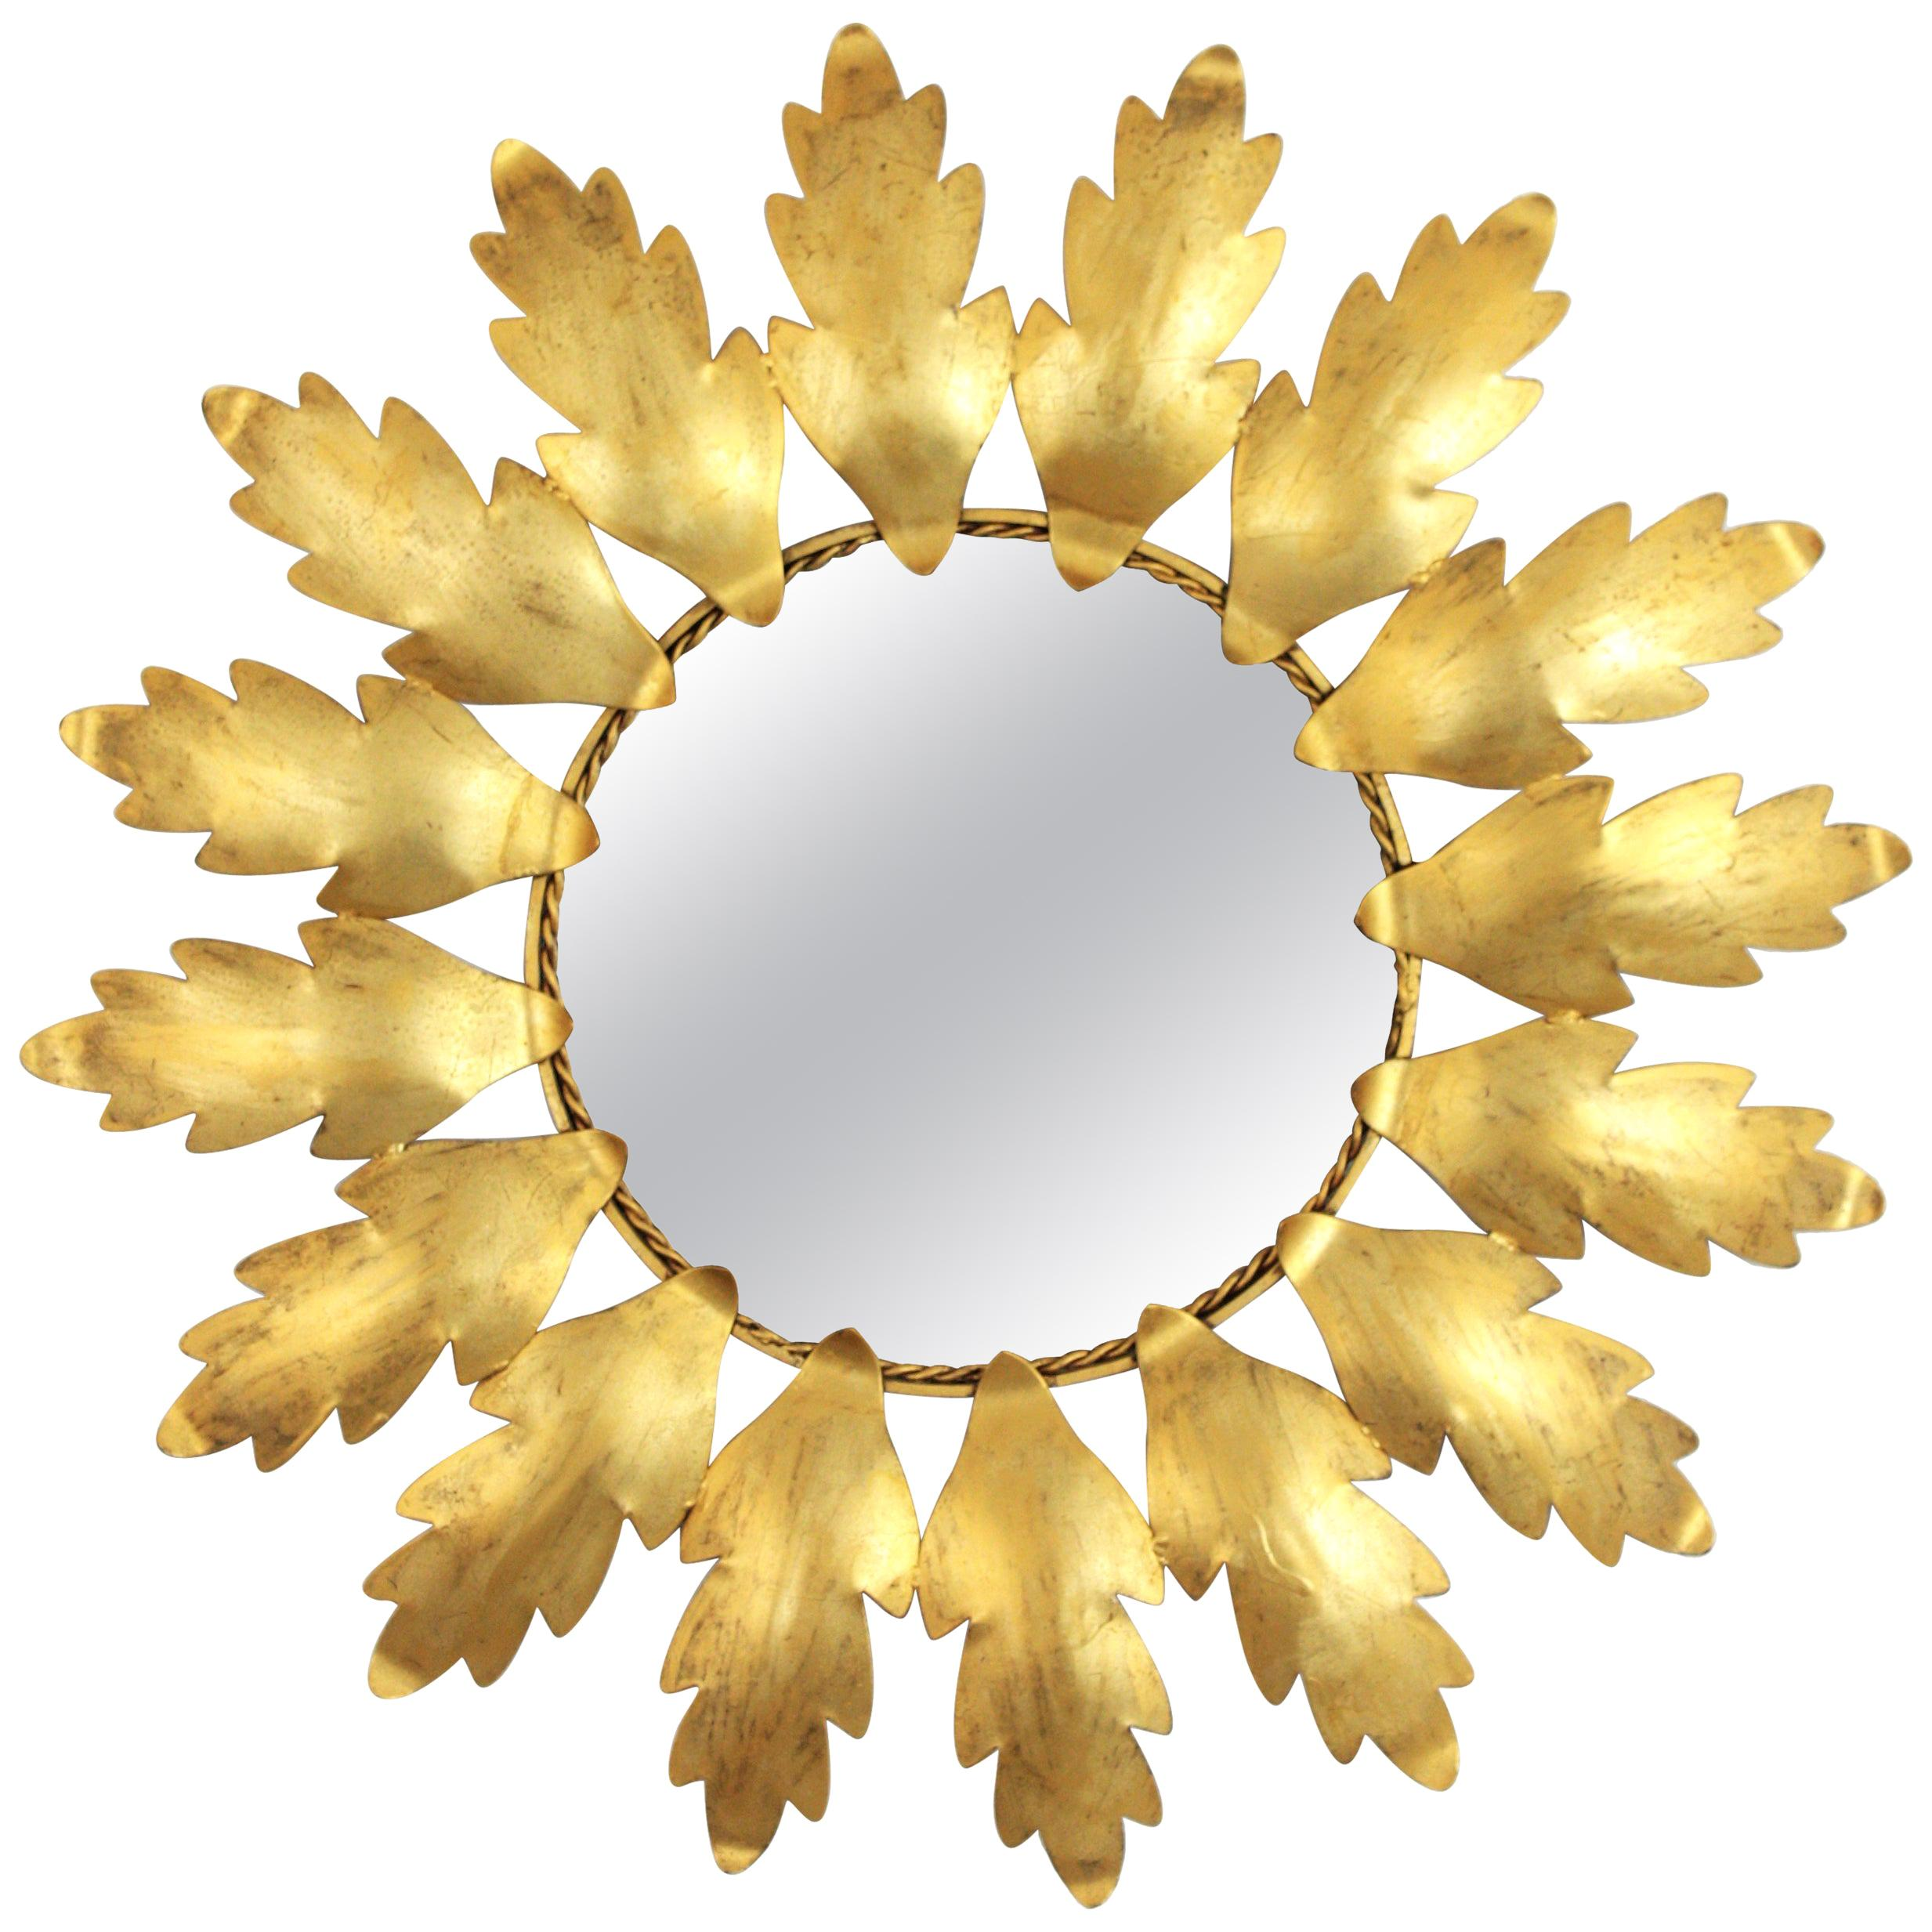 Spanish Sunburst Mirror in Gilt Metal, 1960s